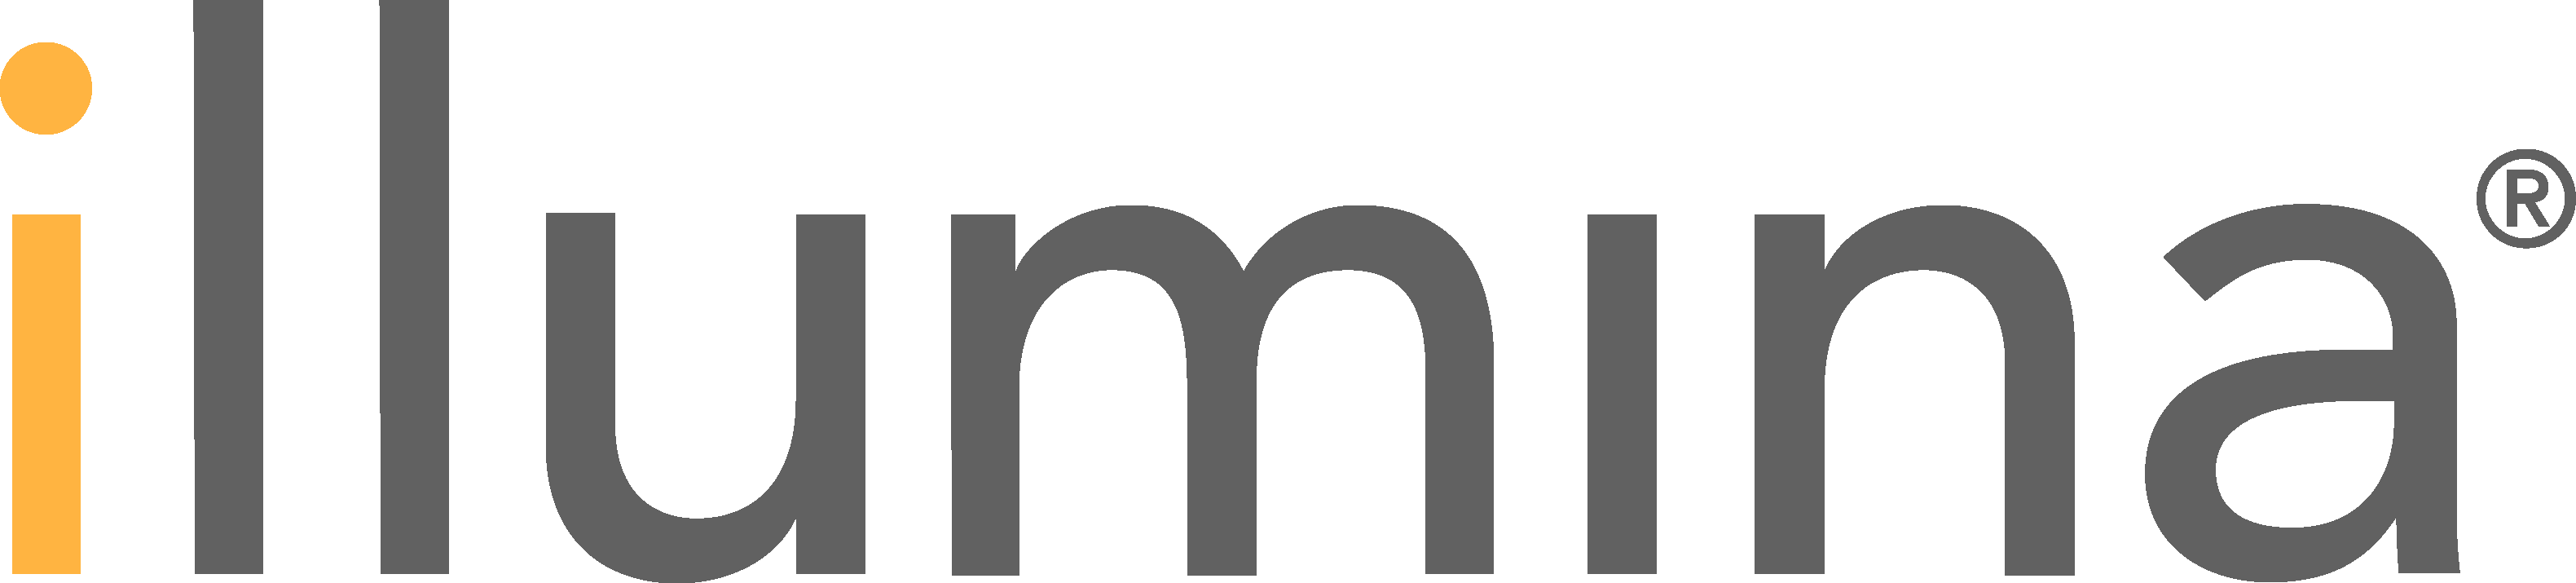 illumina logo png